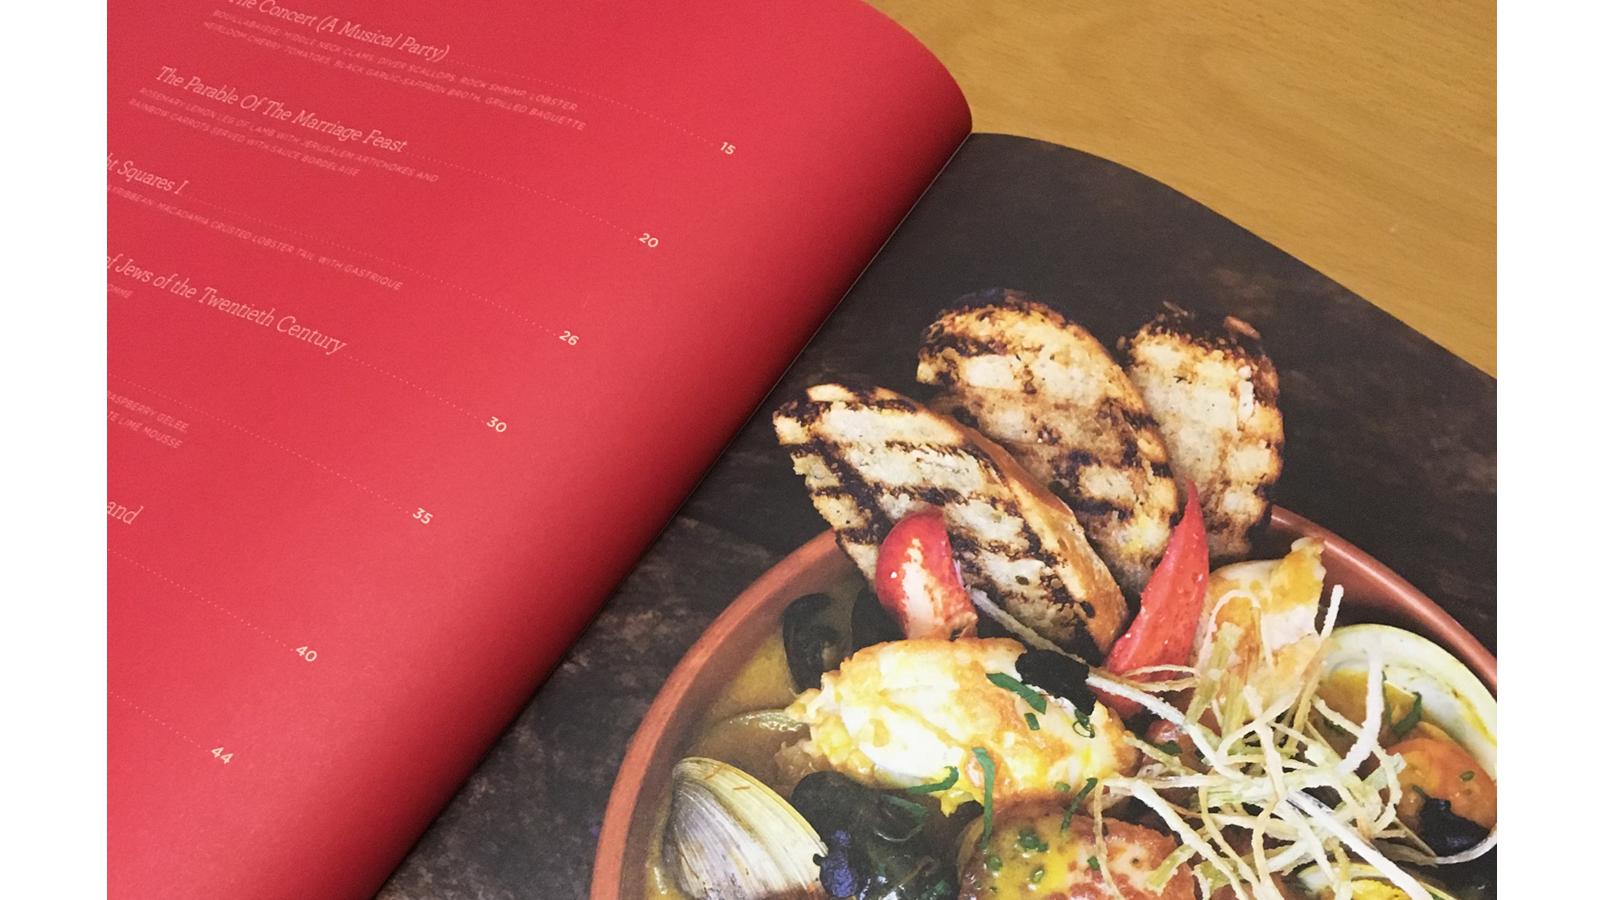 cummer_cookbook_03.png